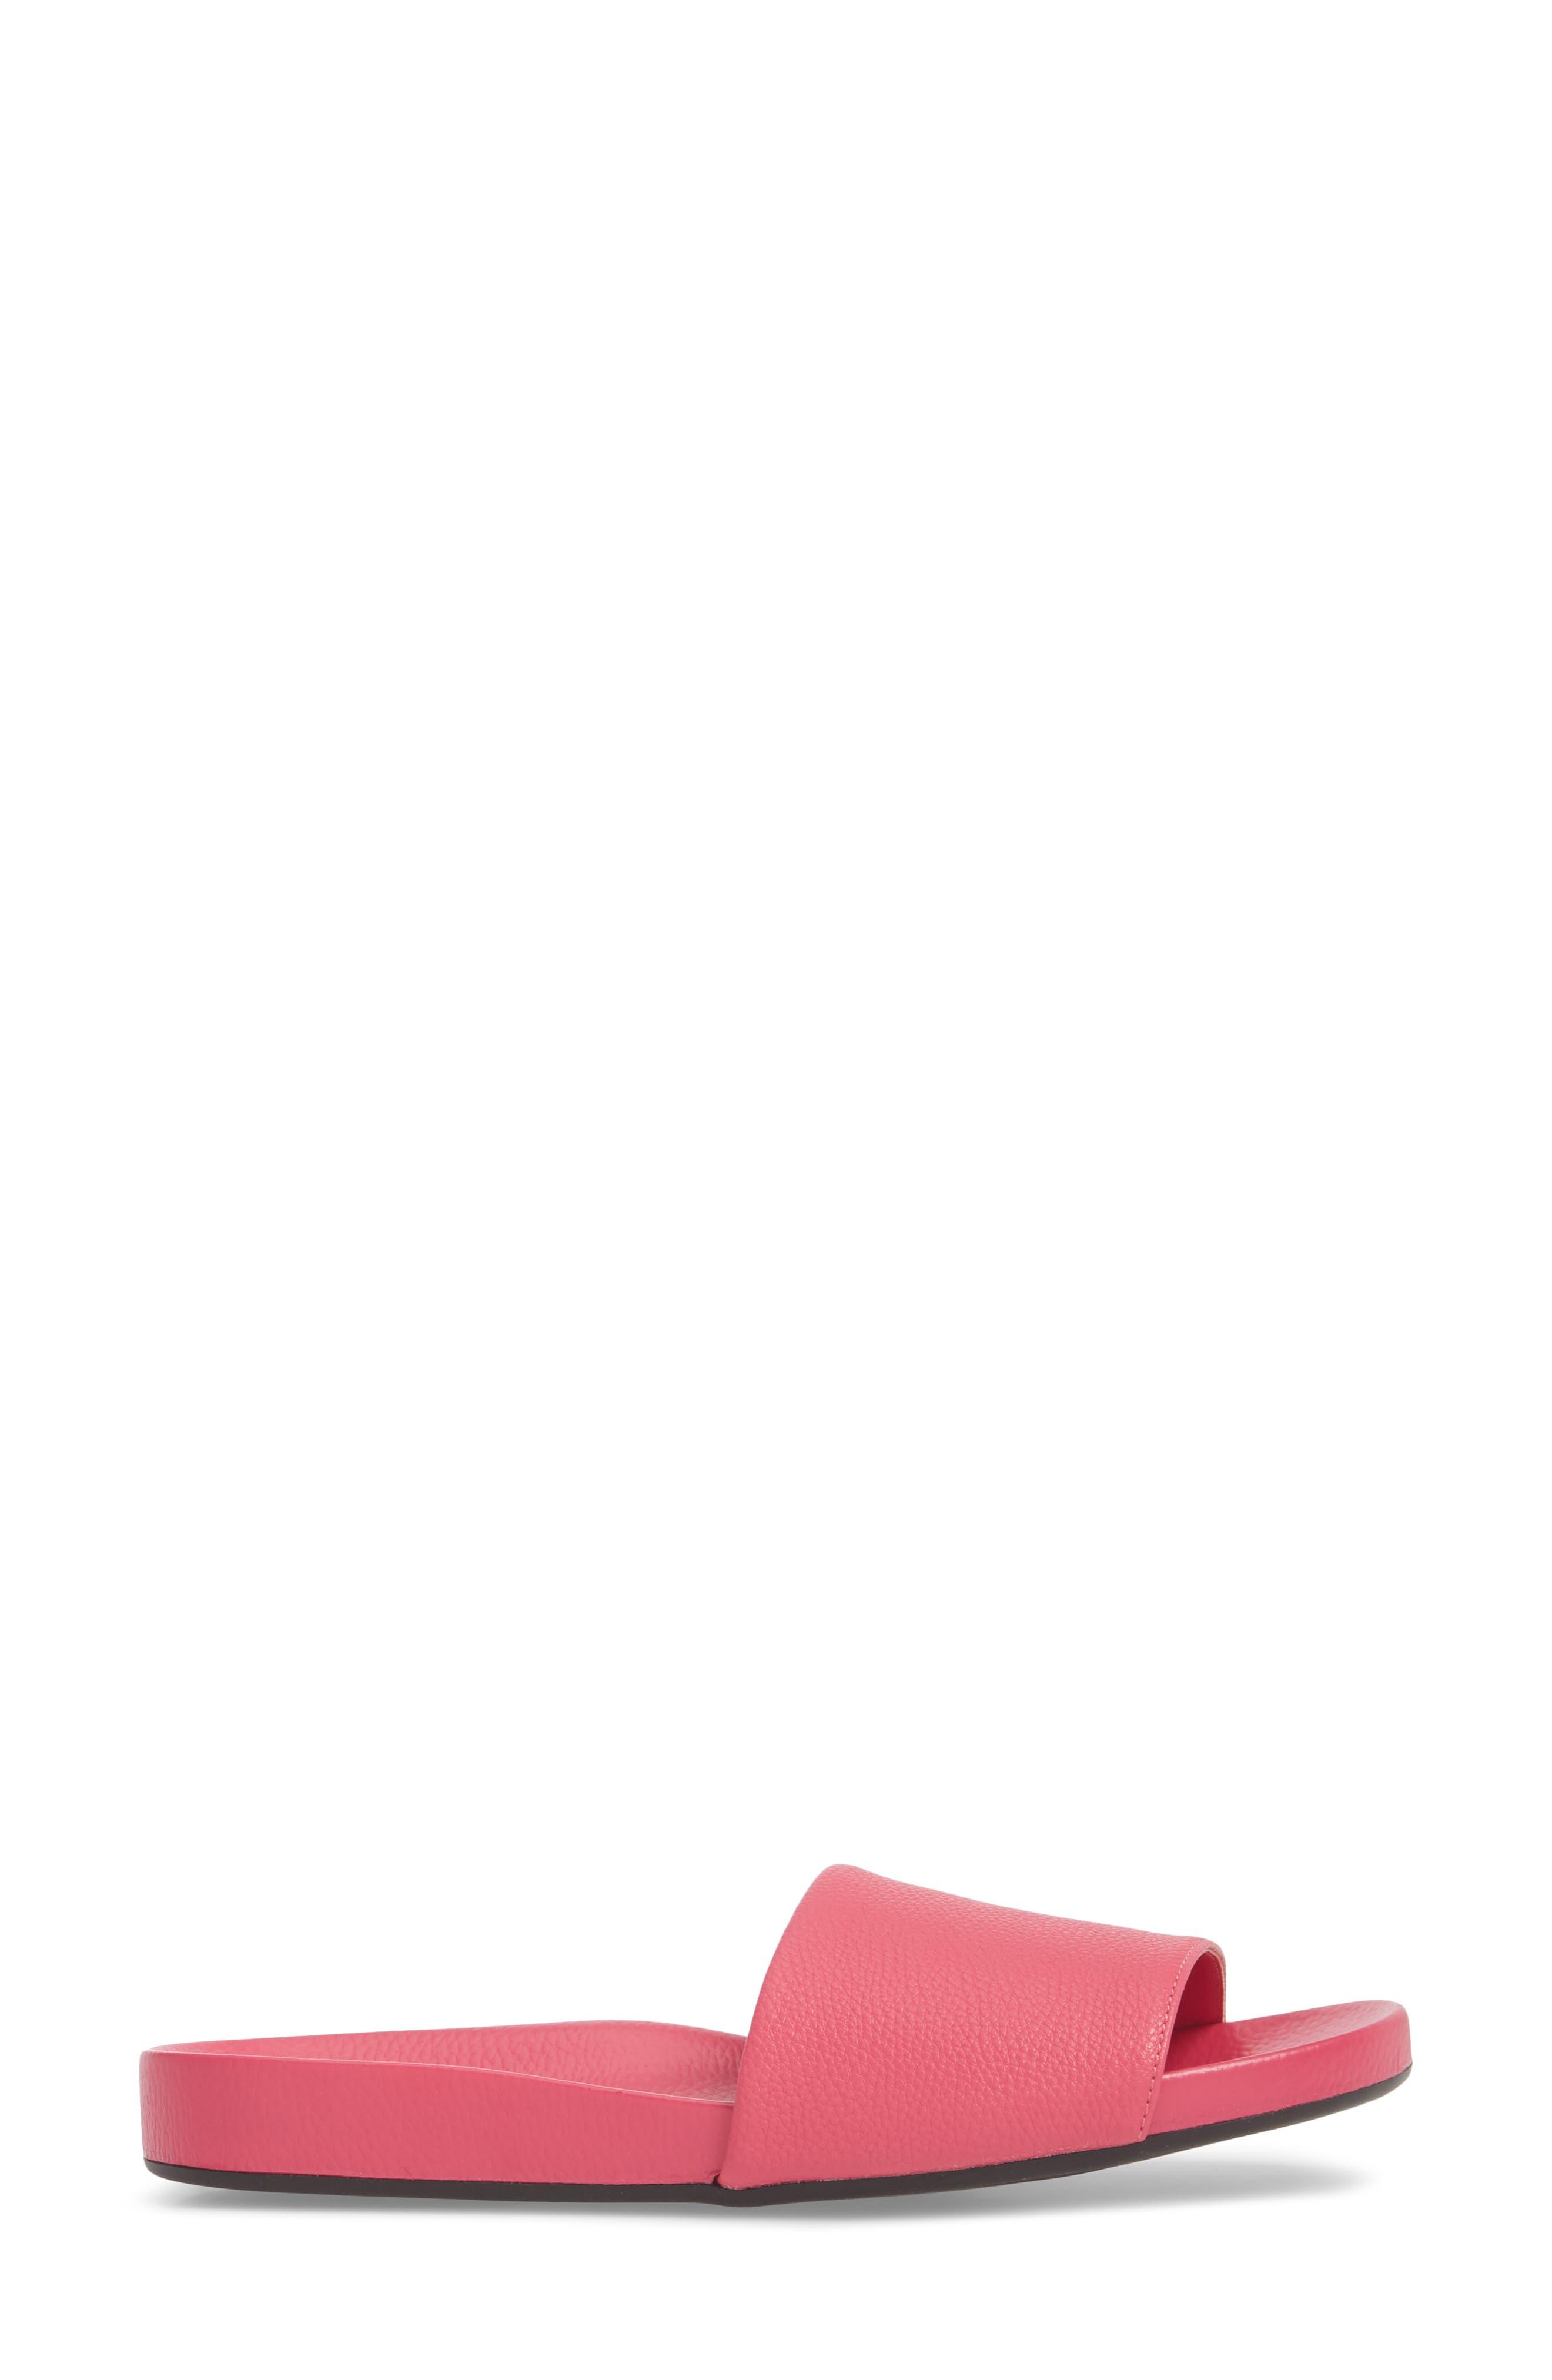 Homie Refined Slide Sandal,                             Alternate thumbnail 3, color,                             PINK